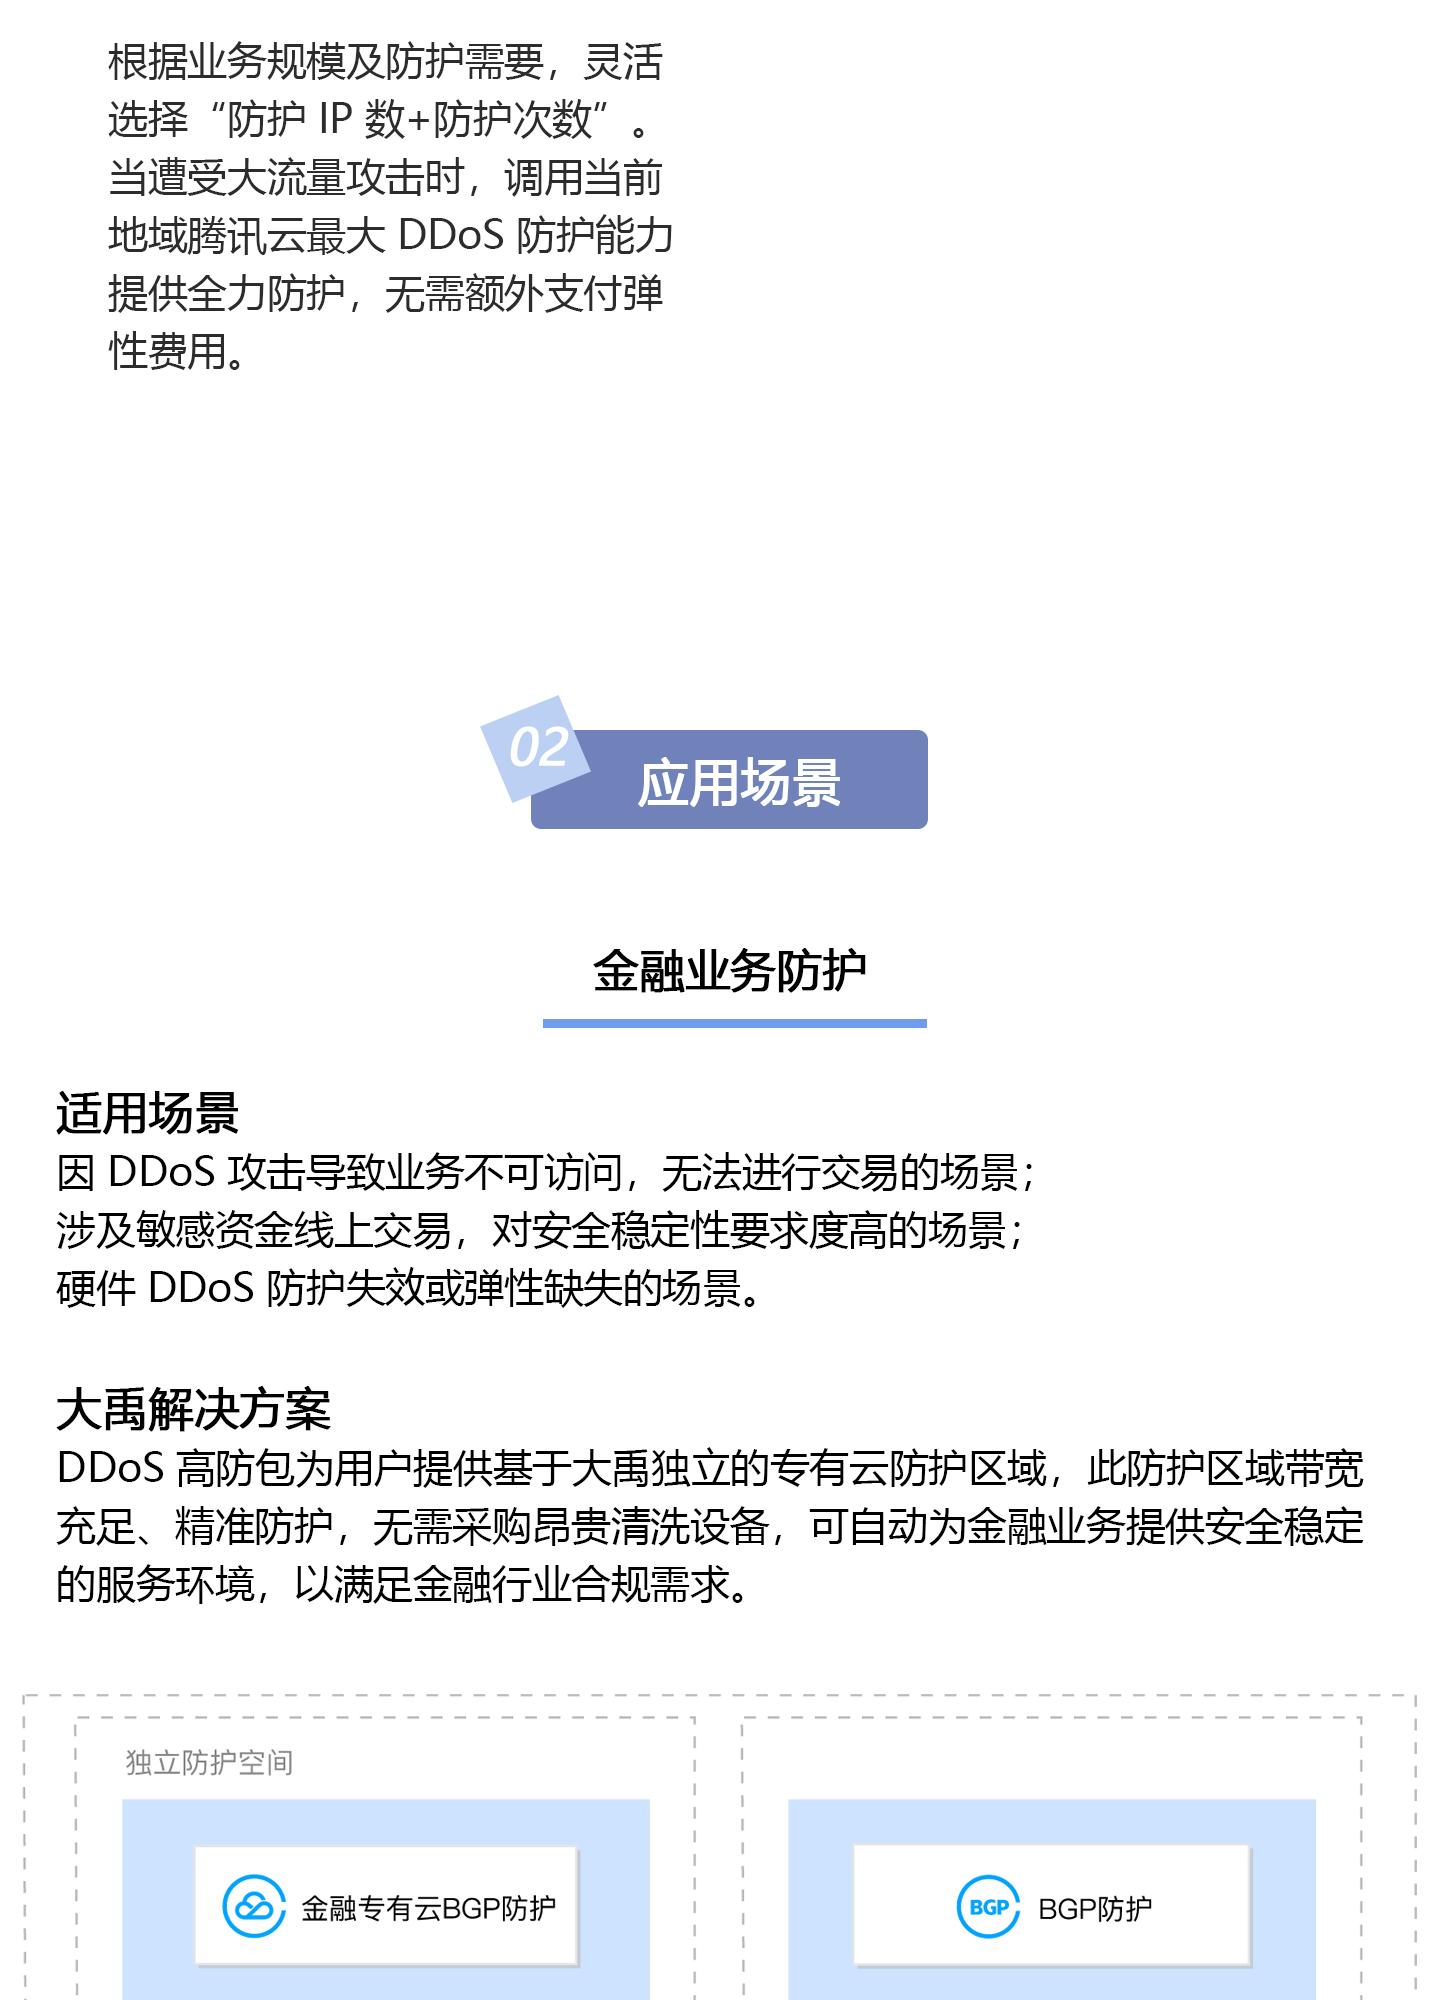 T-Sec-DDoS-高防包1440_03.jpg